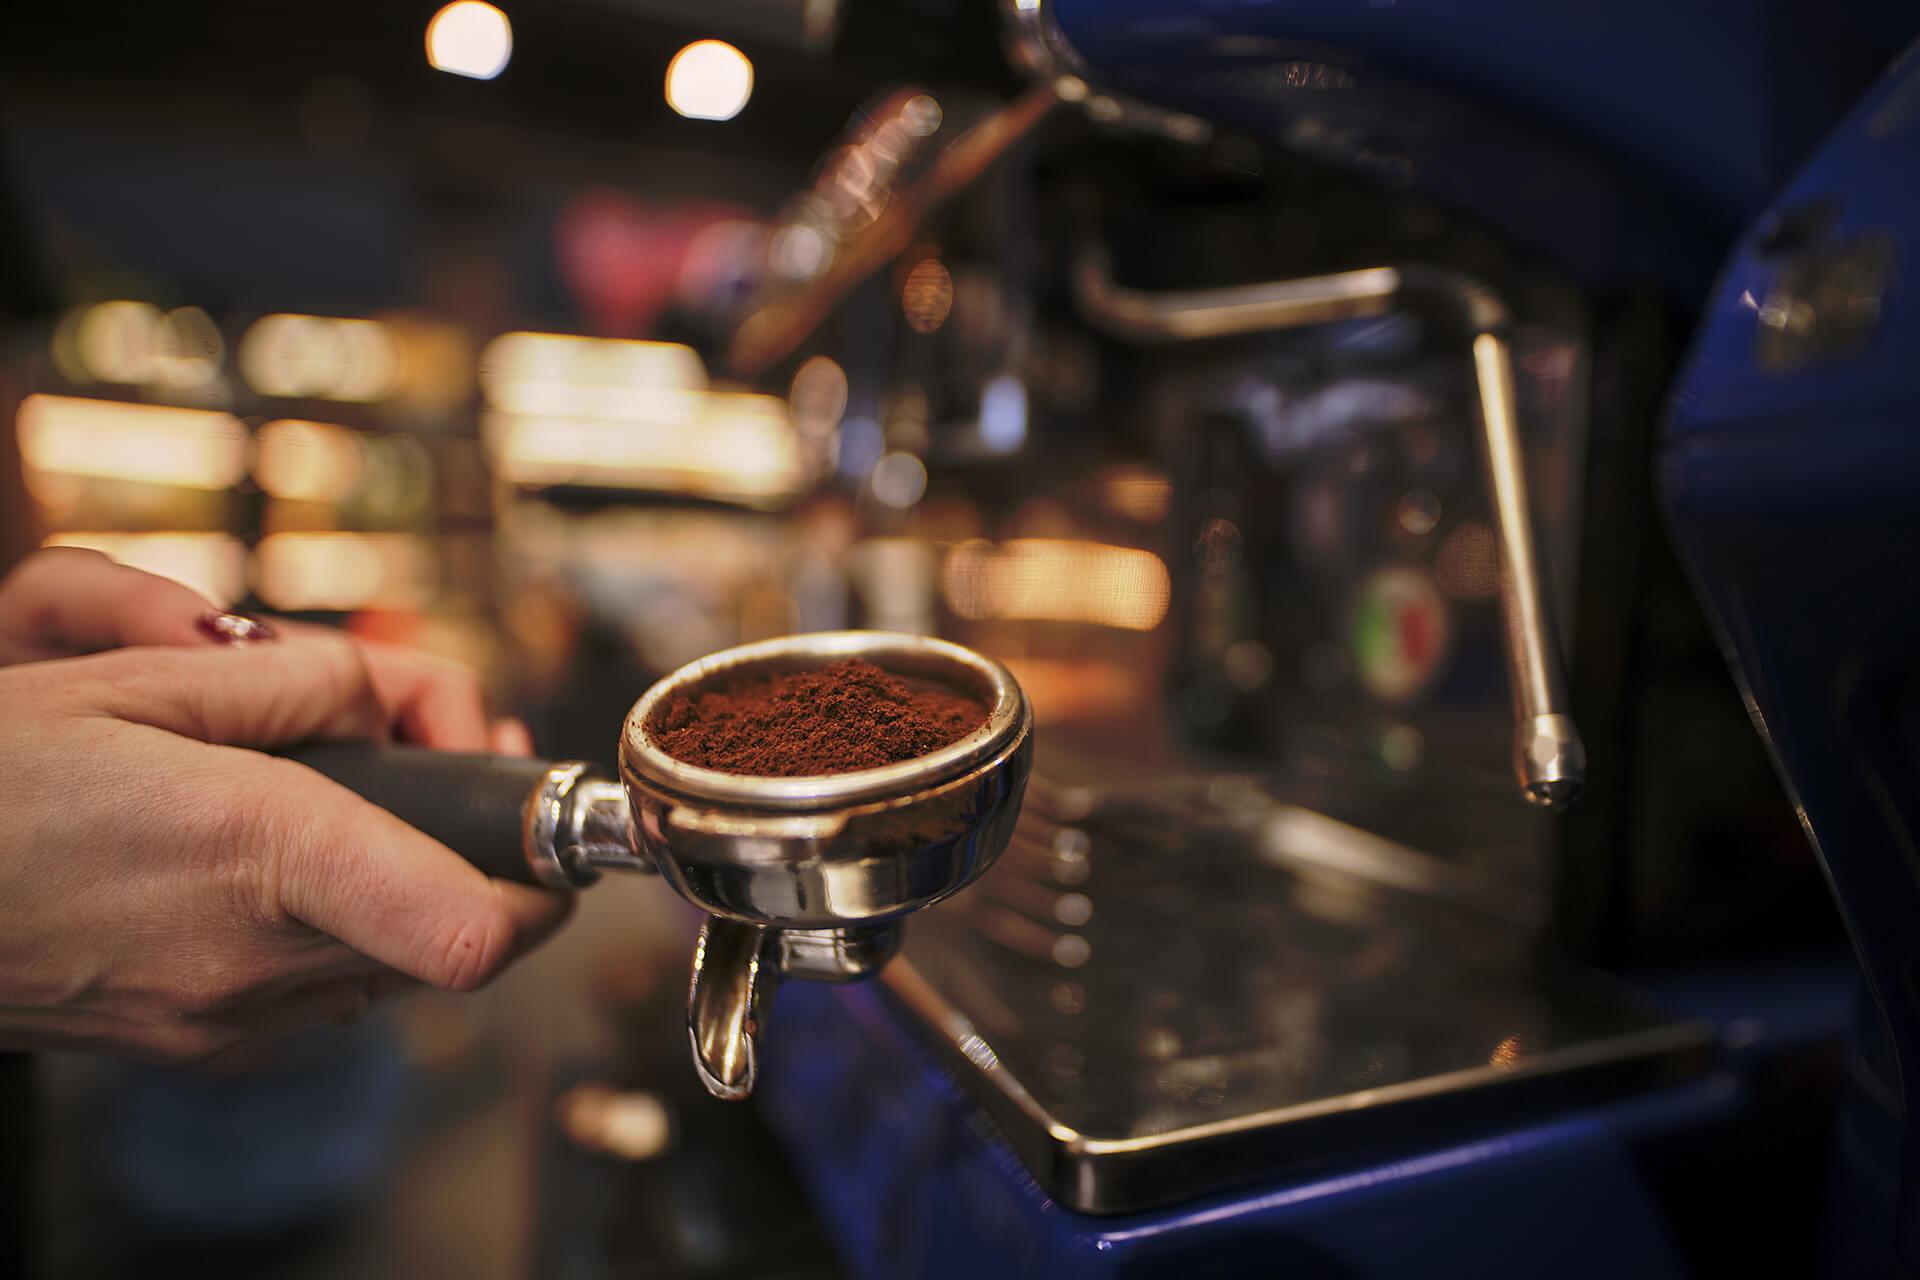 Kawiarnia Stalownia